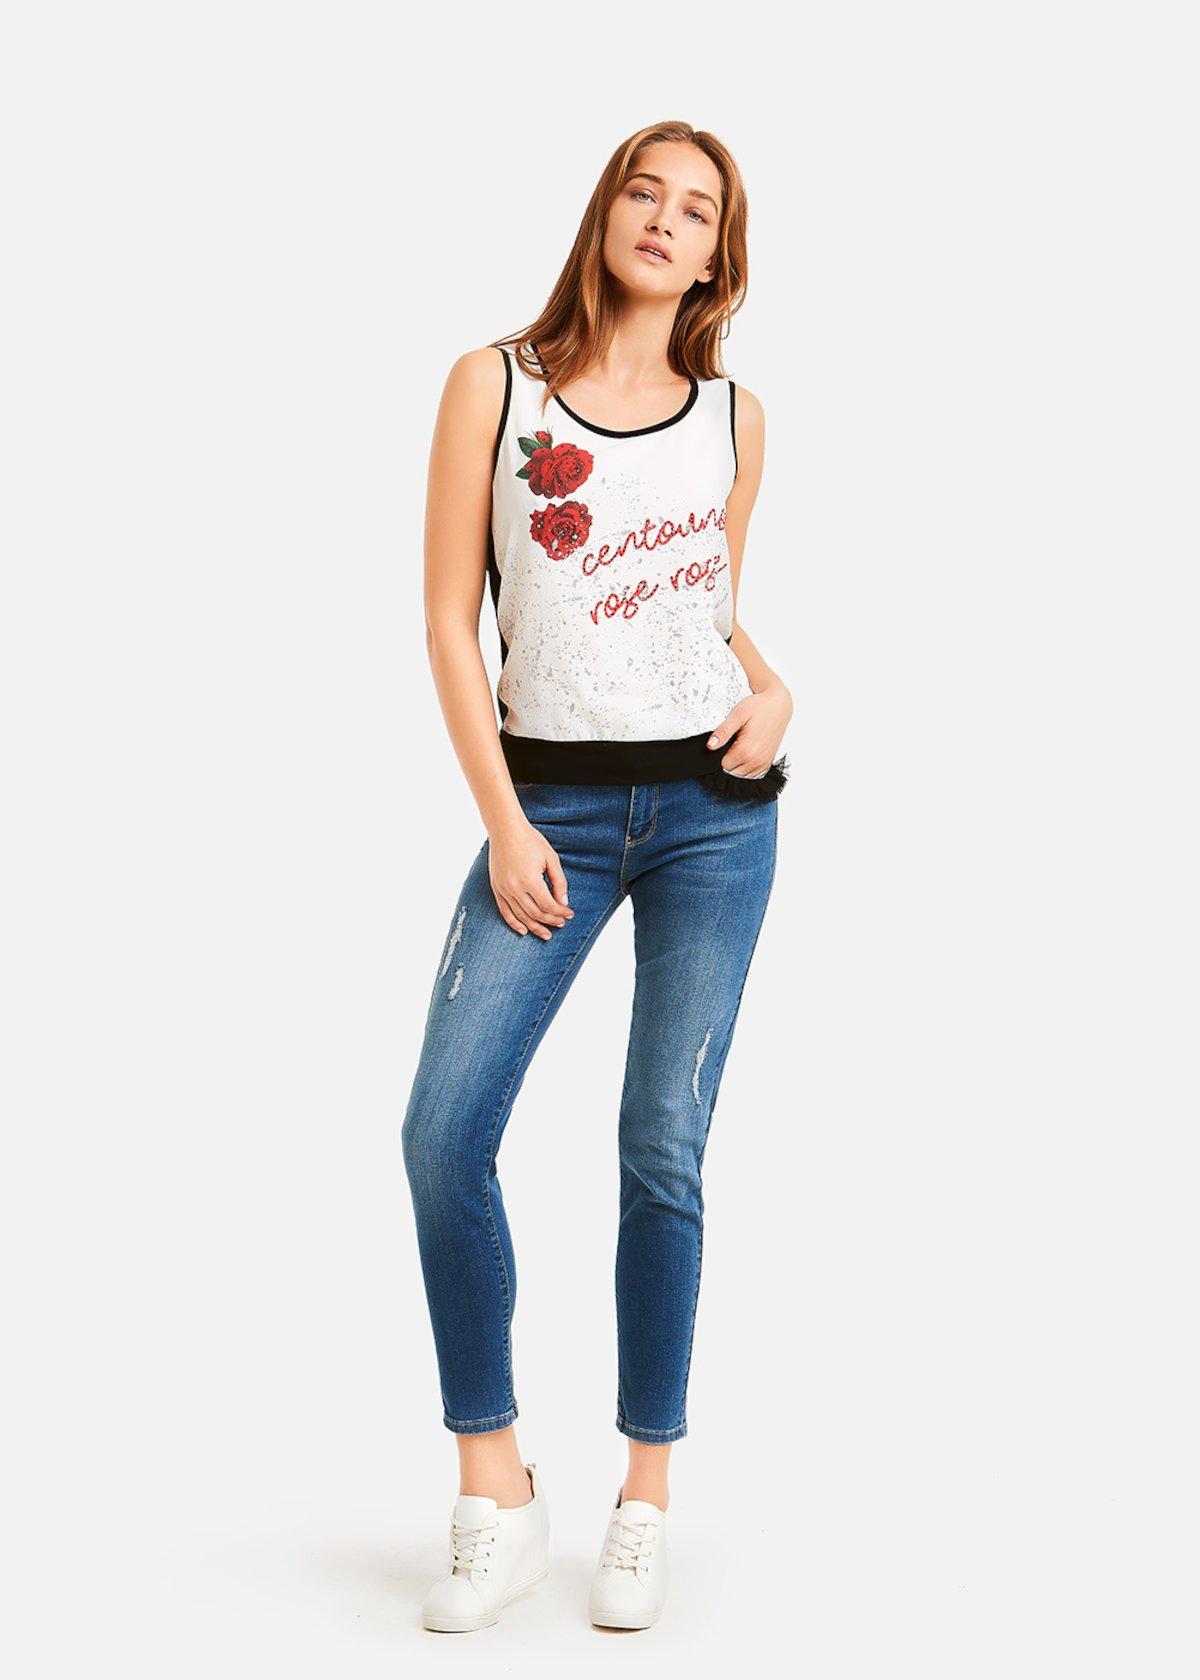 Dider 5 Pocket skinny jeans - Medium Denim